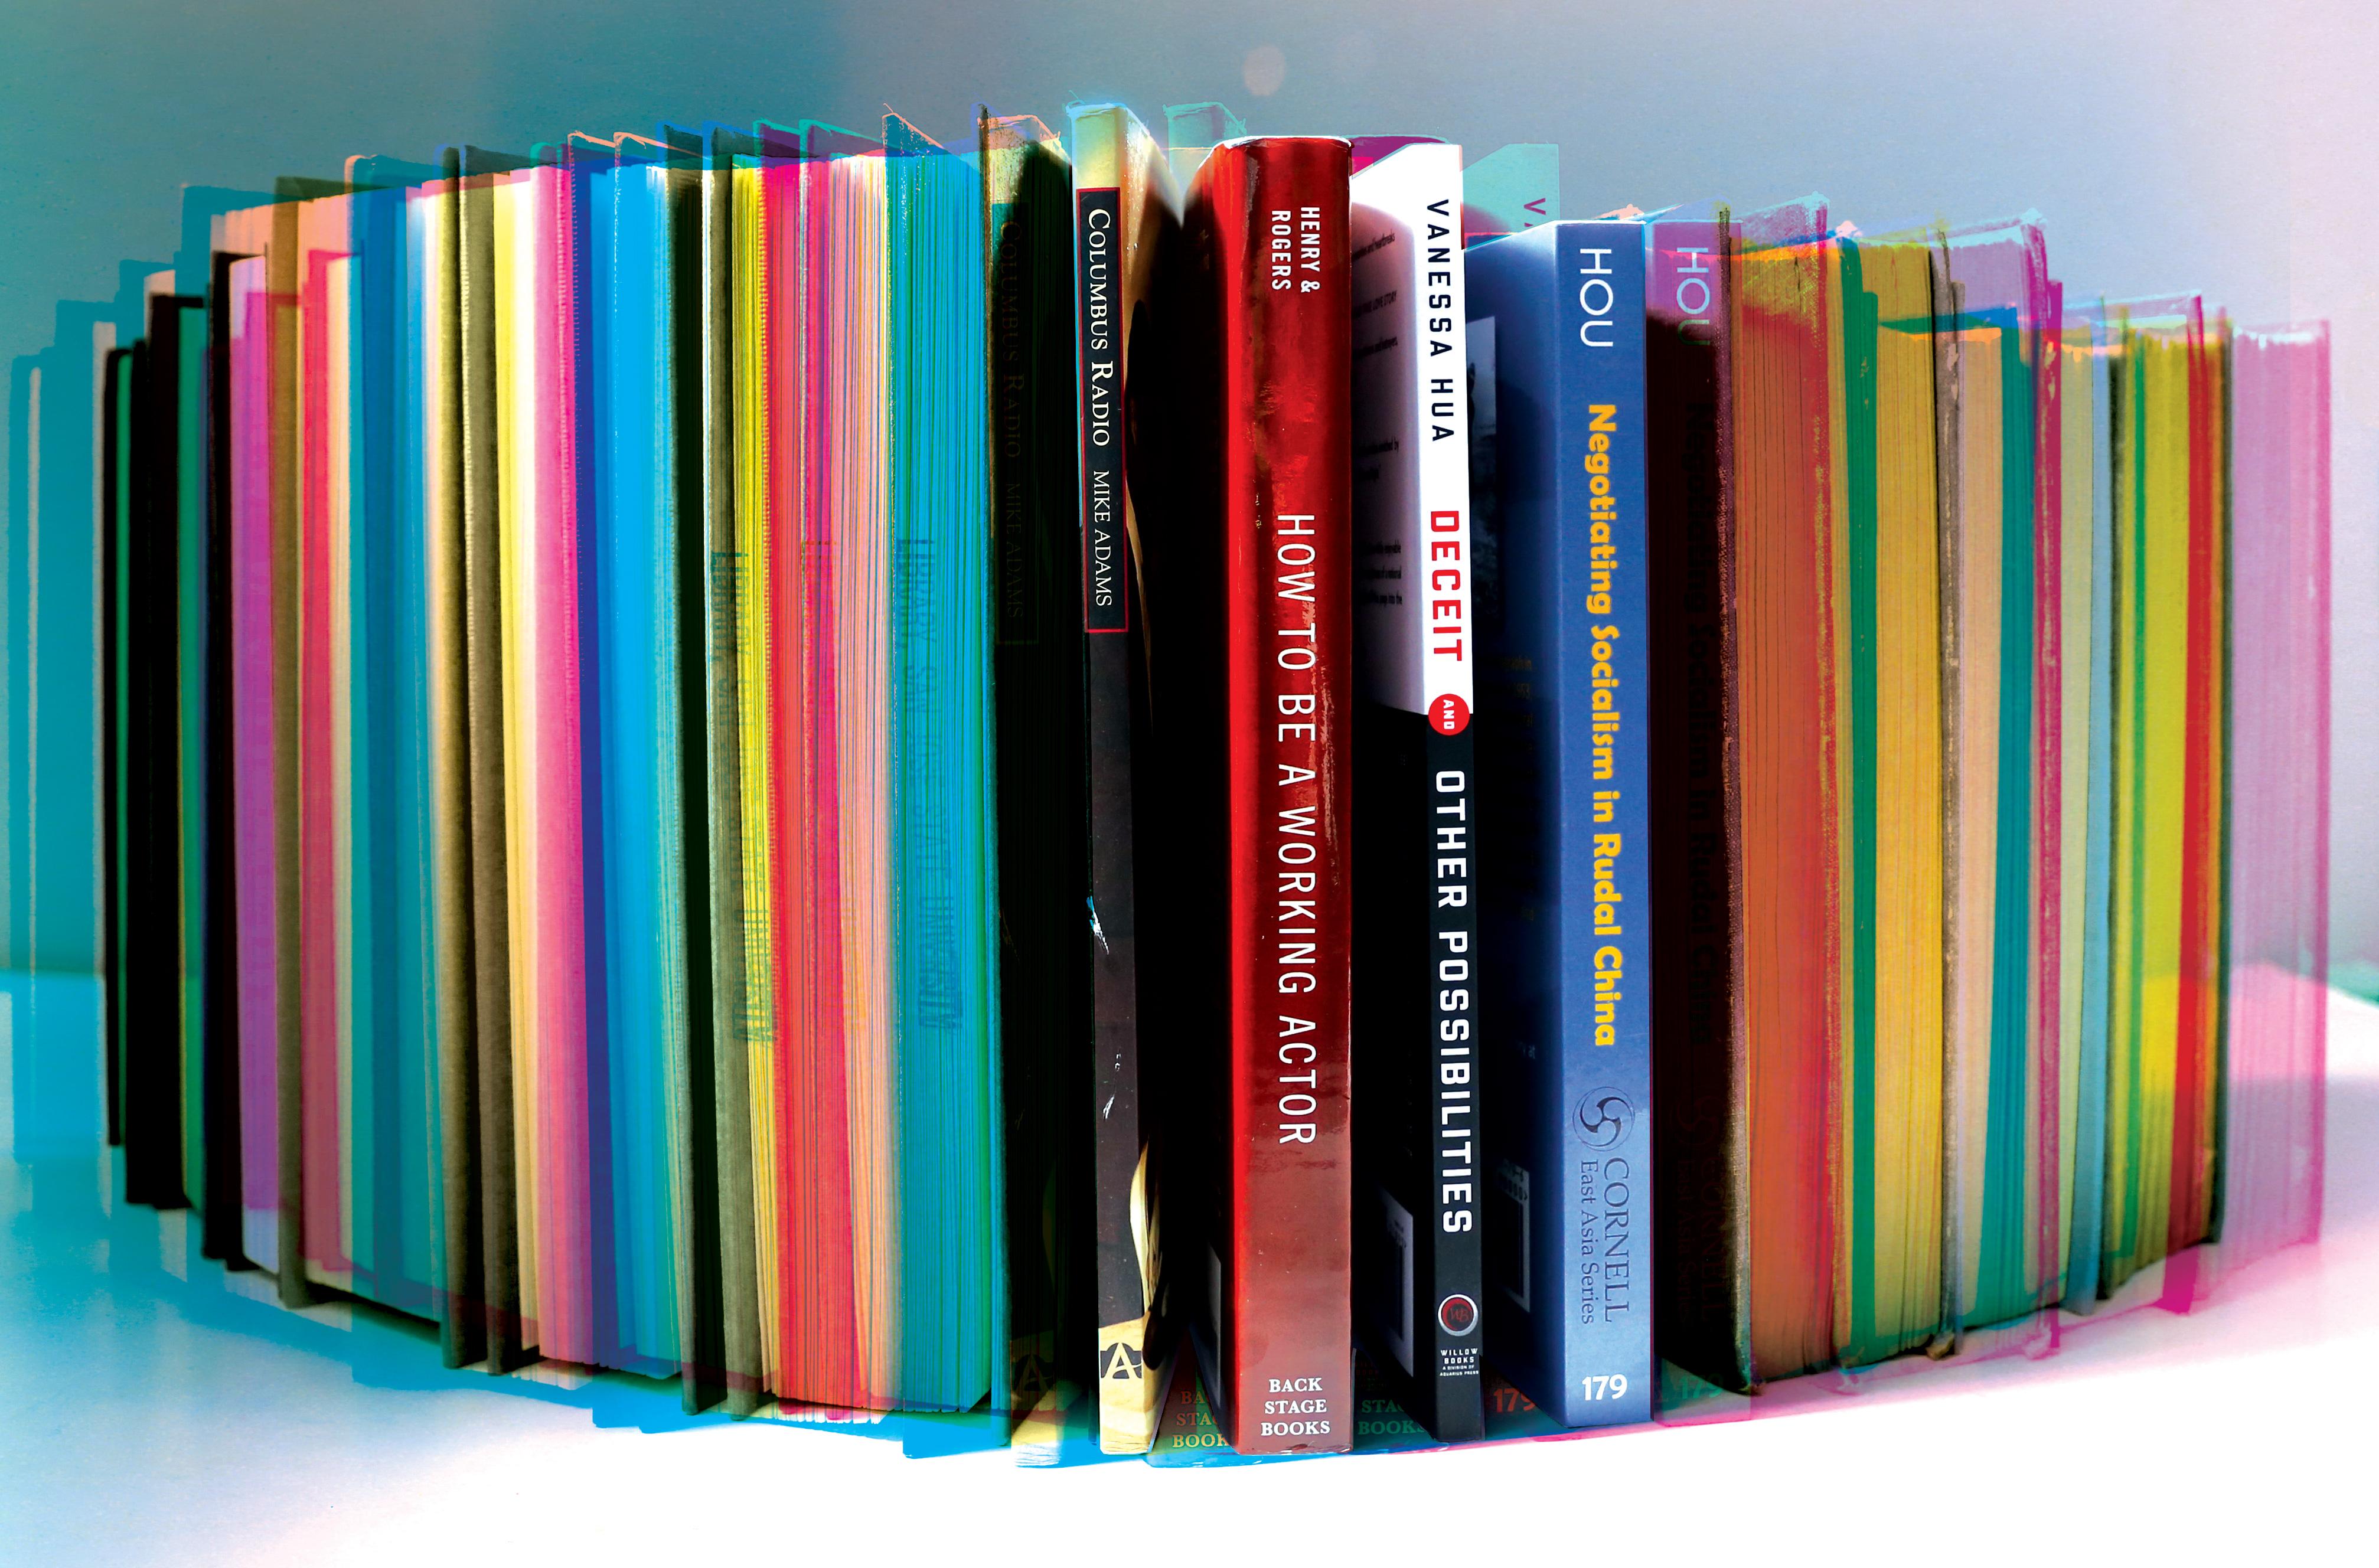 CMYK Bookshelf